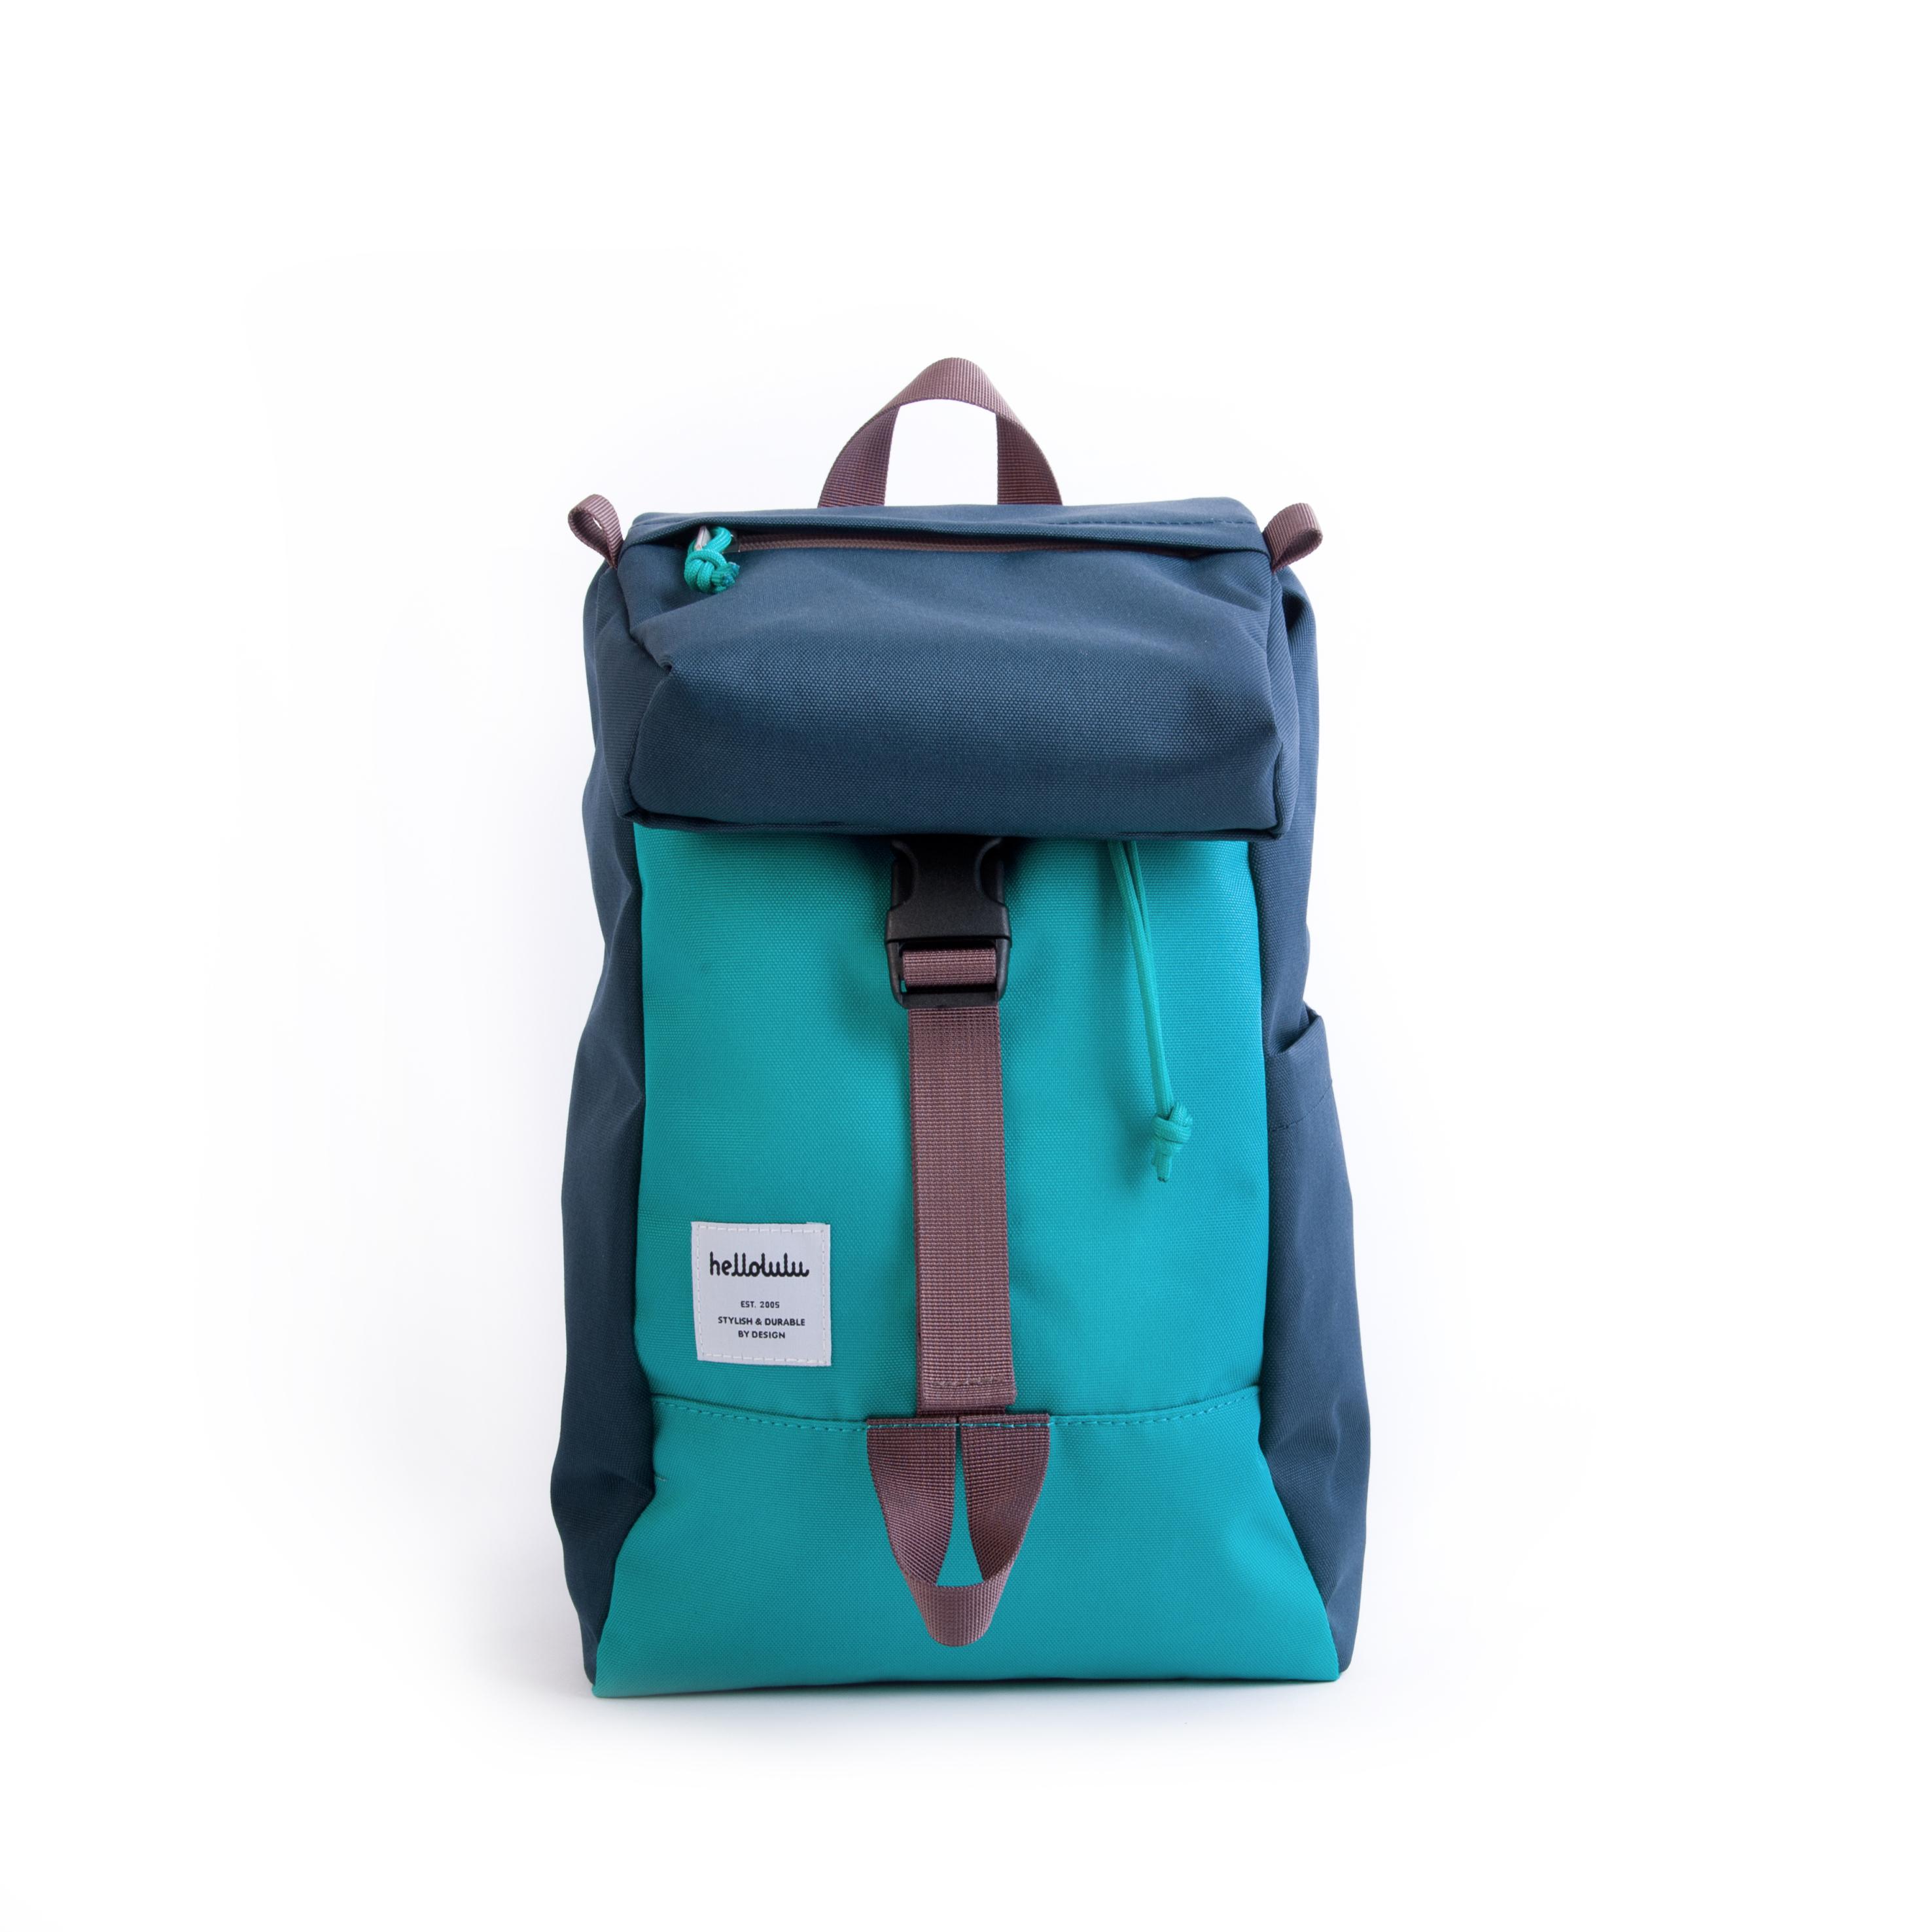 Hellolulu กระเป๋าเด็ก รุ่น MINI SUTTON - NAVY/SKY BLUE